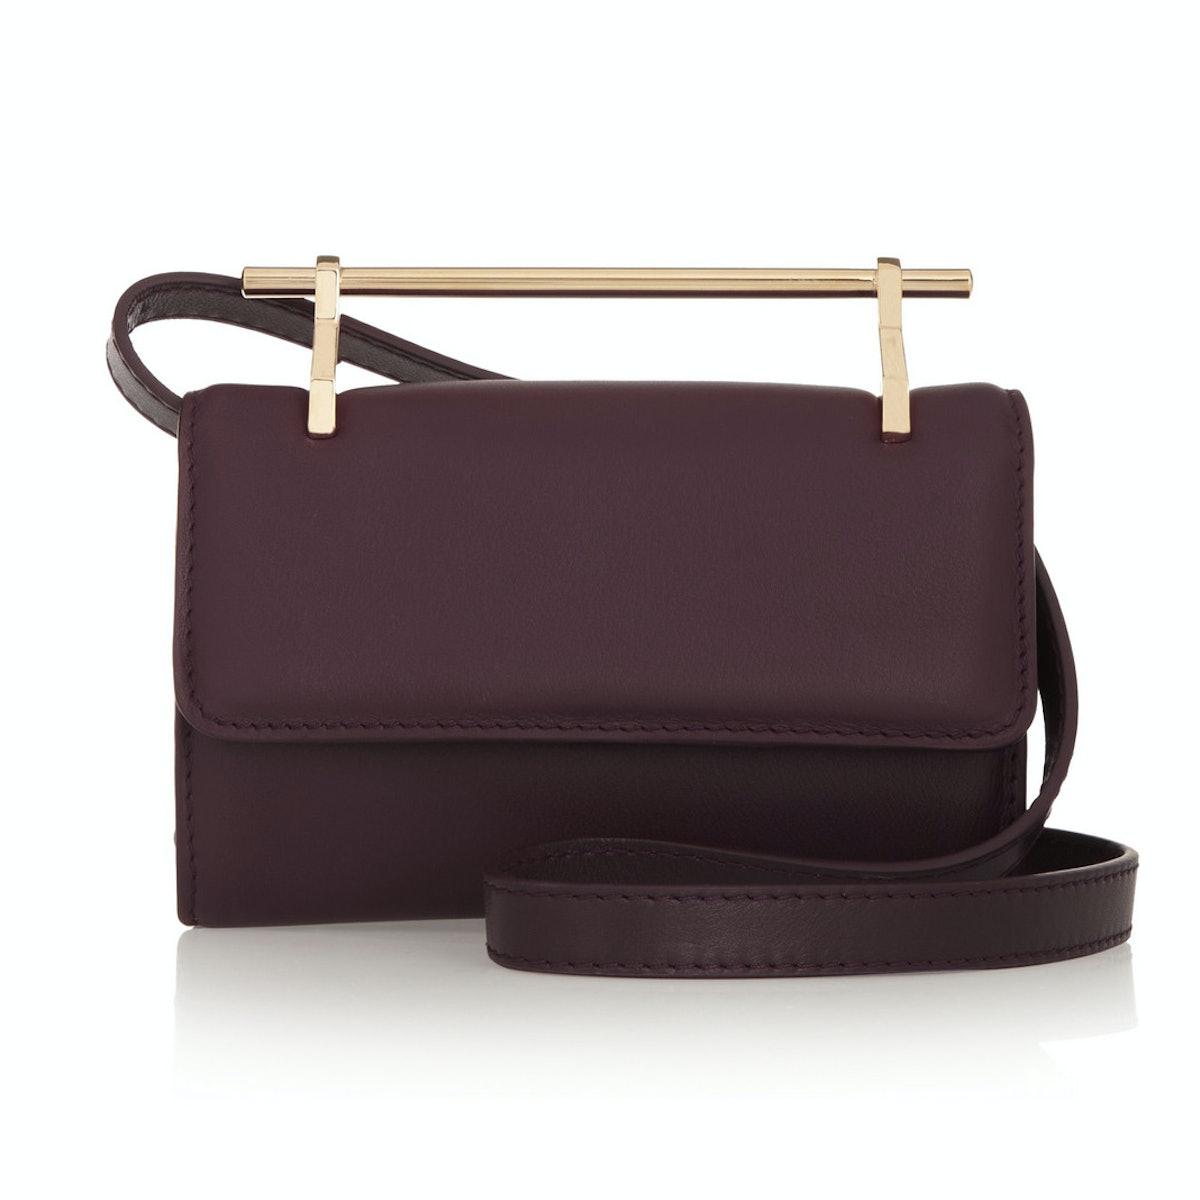 M2MALLETIER bag